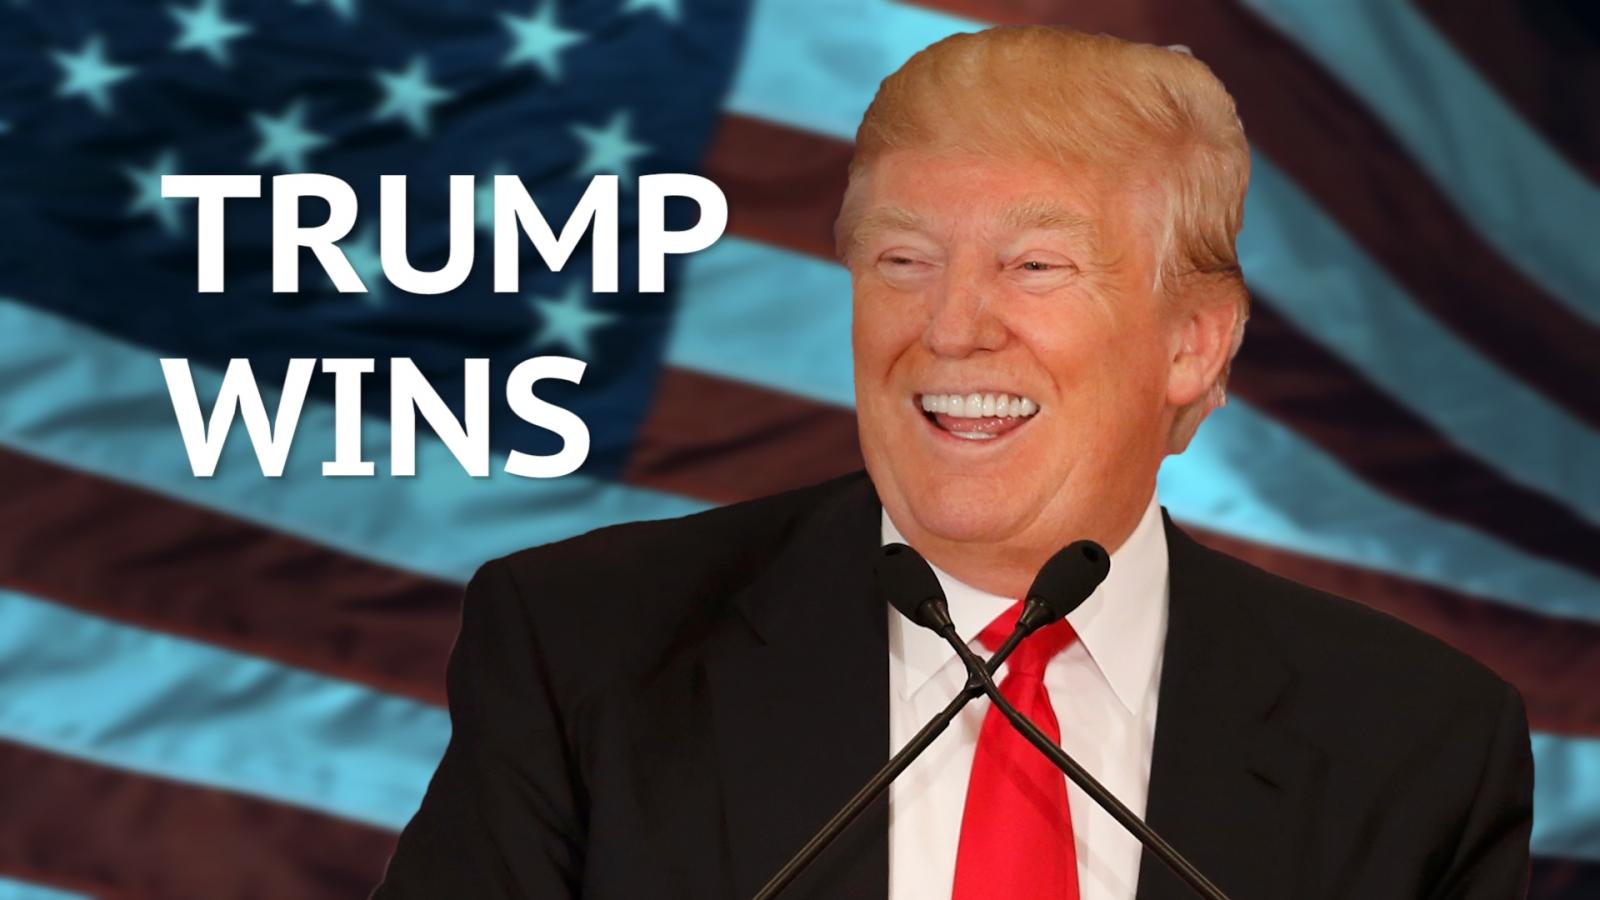 donald-trump-triumphs-shock-us-election-victory.jpg